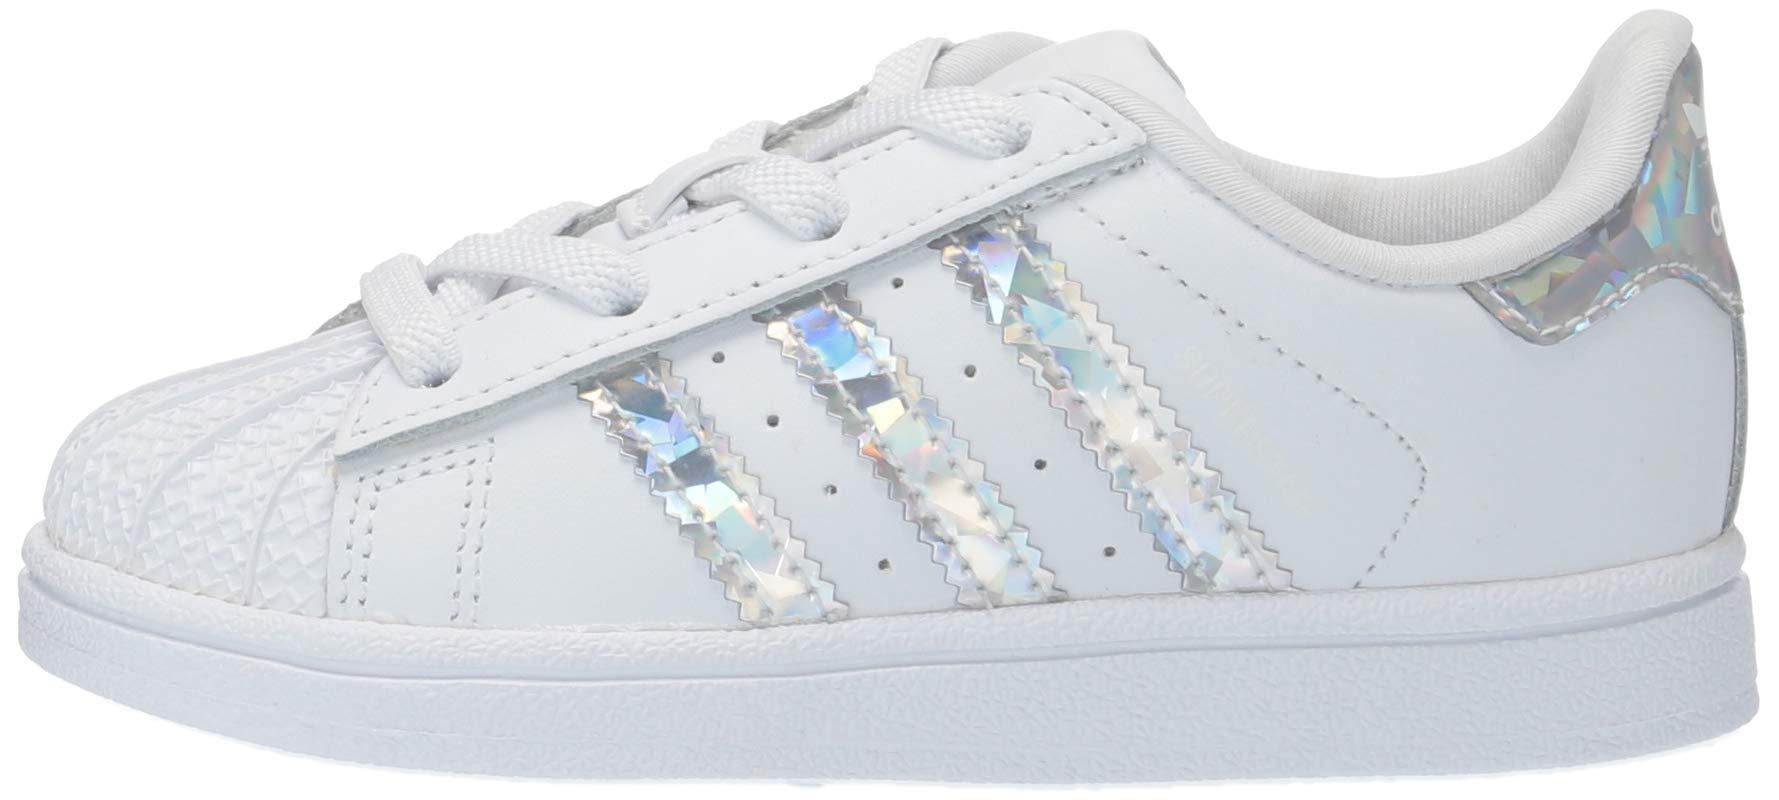 adidas Originals Unisex Superstar Running Shoe, White/White/White, 1 M US Little Kid by adidas Originals (Image #5)